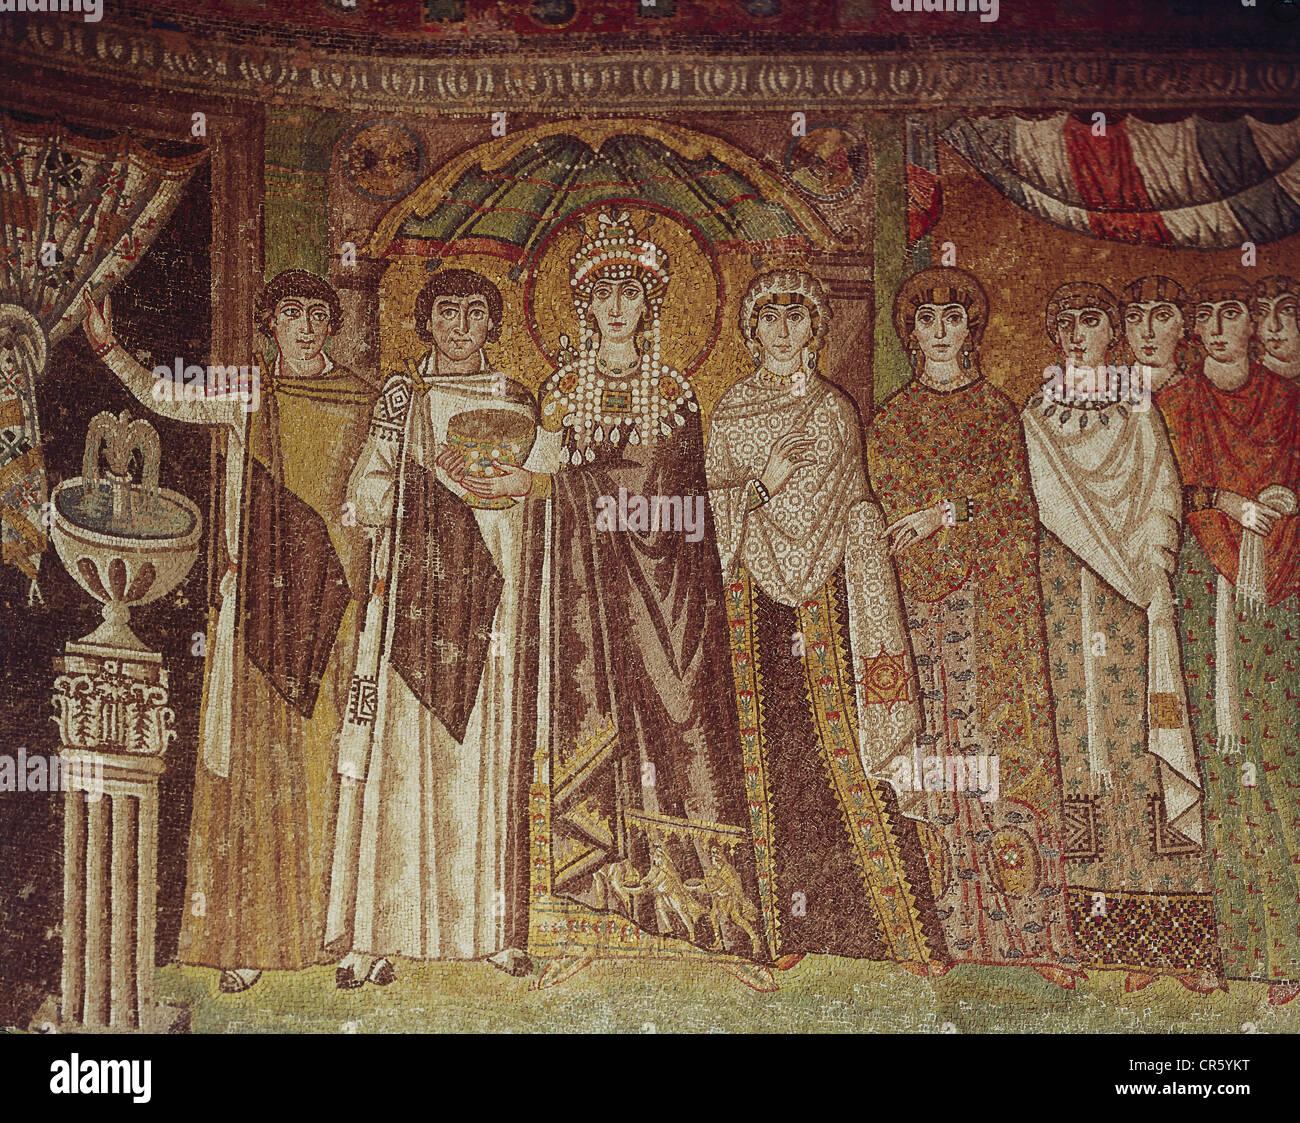 Theodora I, 497 - 28.6.548, Byzantine Empress, mosaic, Basilica of San Vitale, Ravenna, circa 540, Romanesque, early - Stock Image